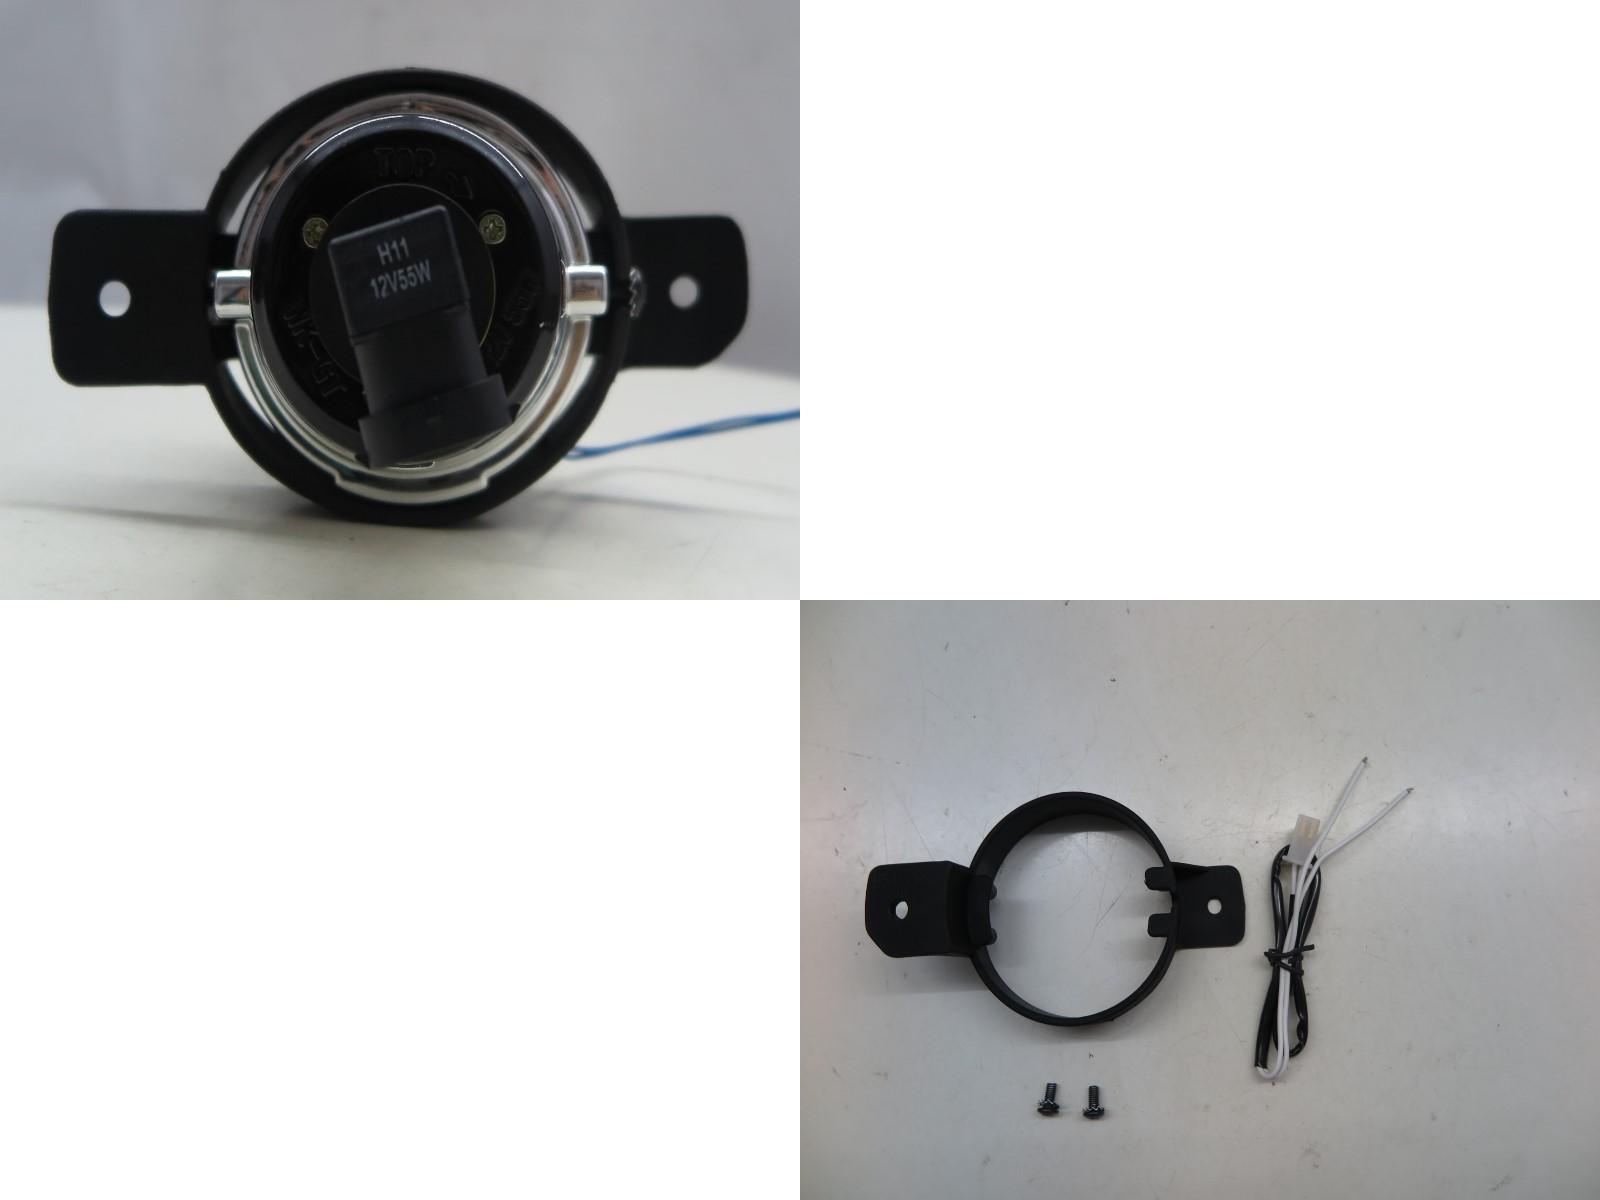 thumbnail 4 - Espace IV MK4 2003-2014 MPV 5D Projector Dual Beam Fog Light Black for RENAULT